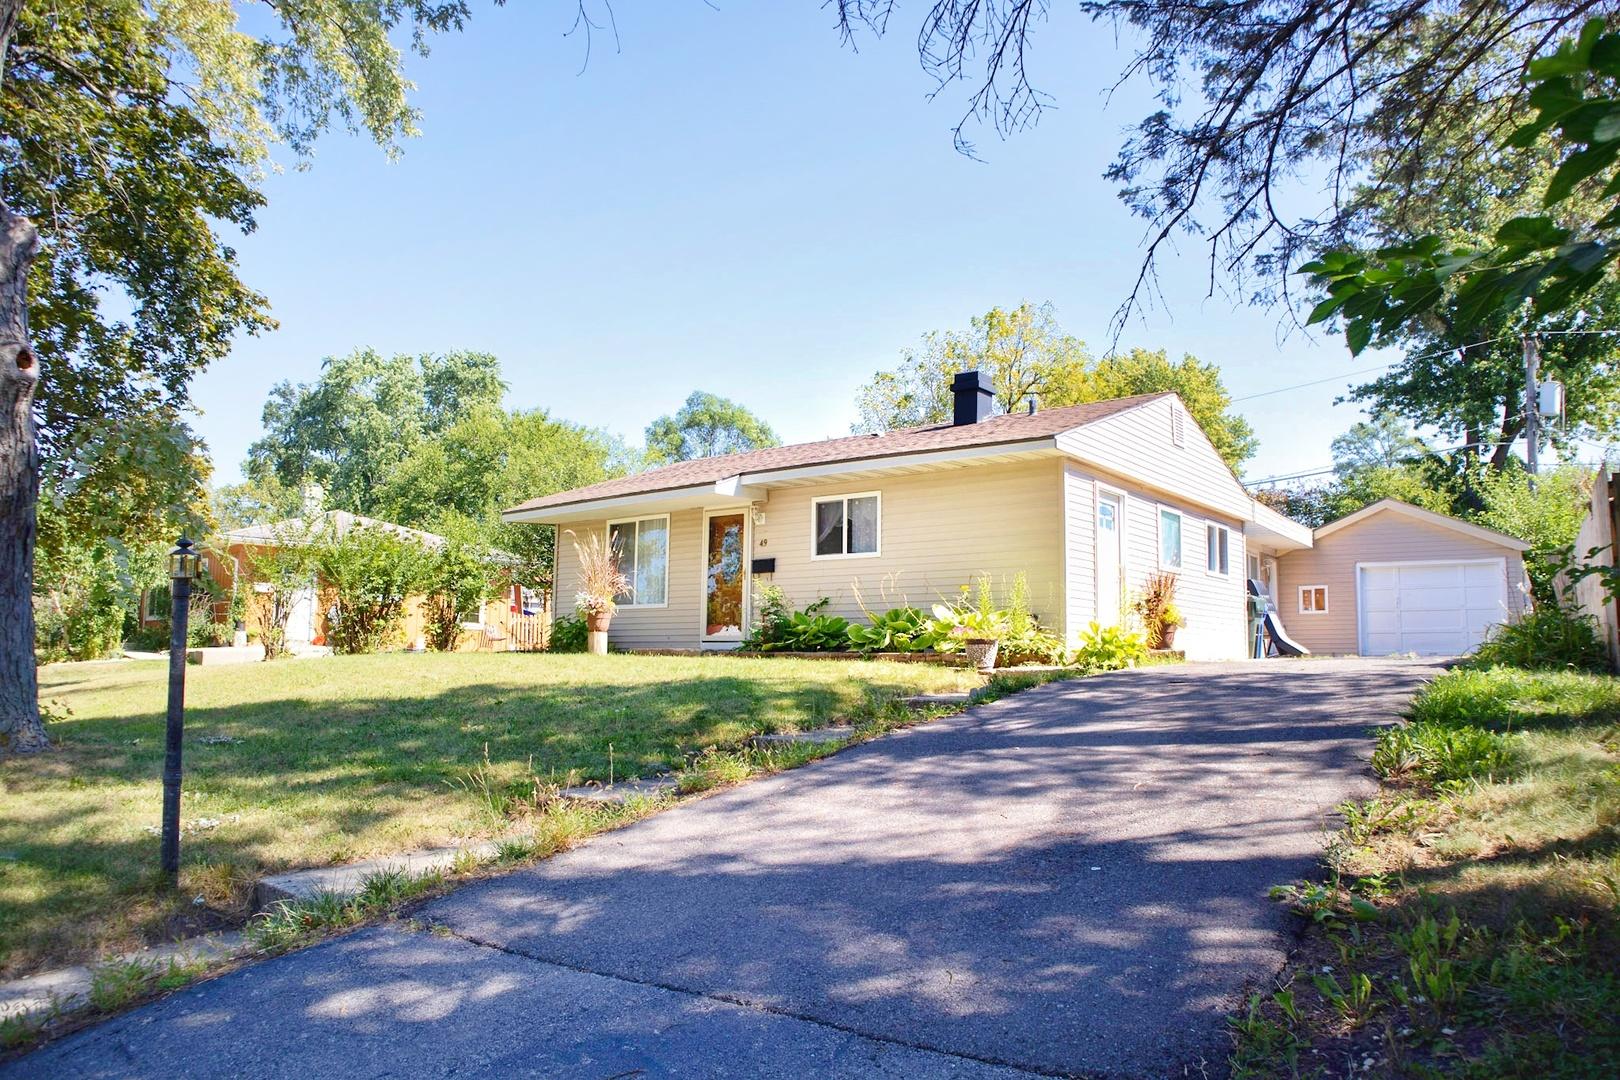 49 WREN Road, Carpentersville IL 60110